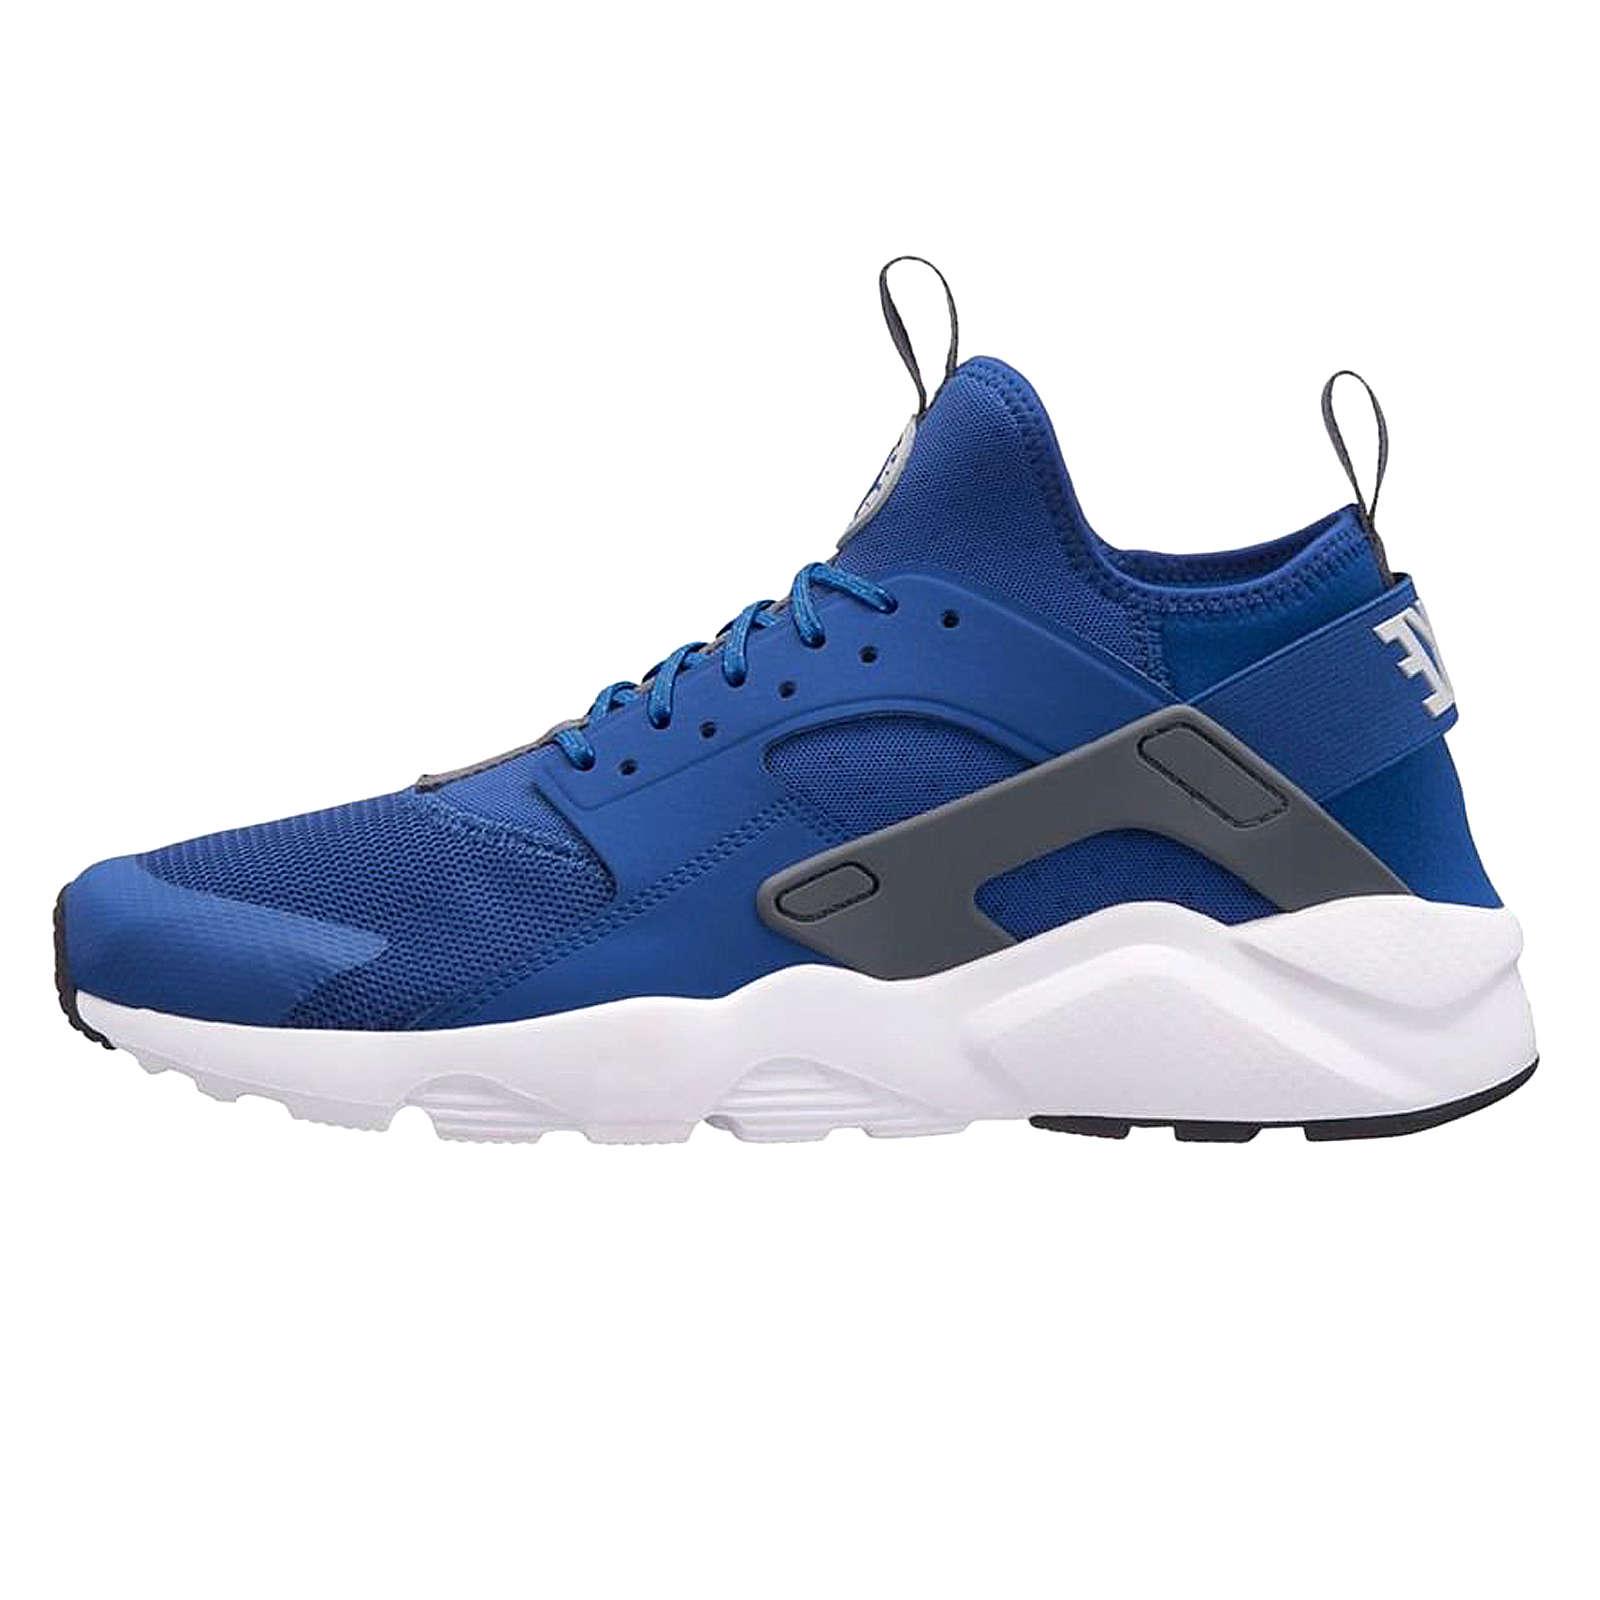 NIKE AIR HUARACHE RUN ULTRA 819685-411 Sneakers Low blau Herren Gr. 40,5